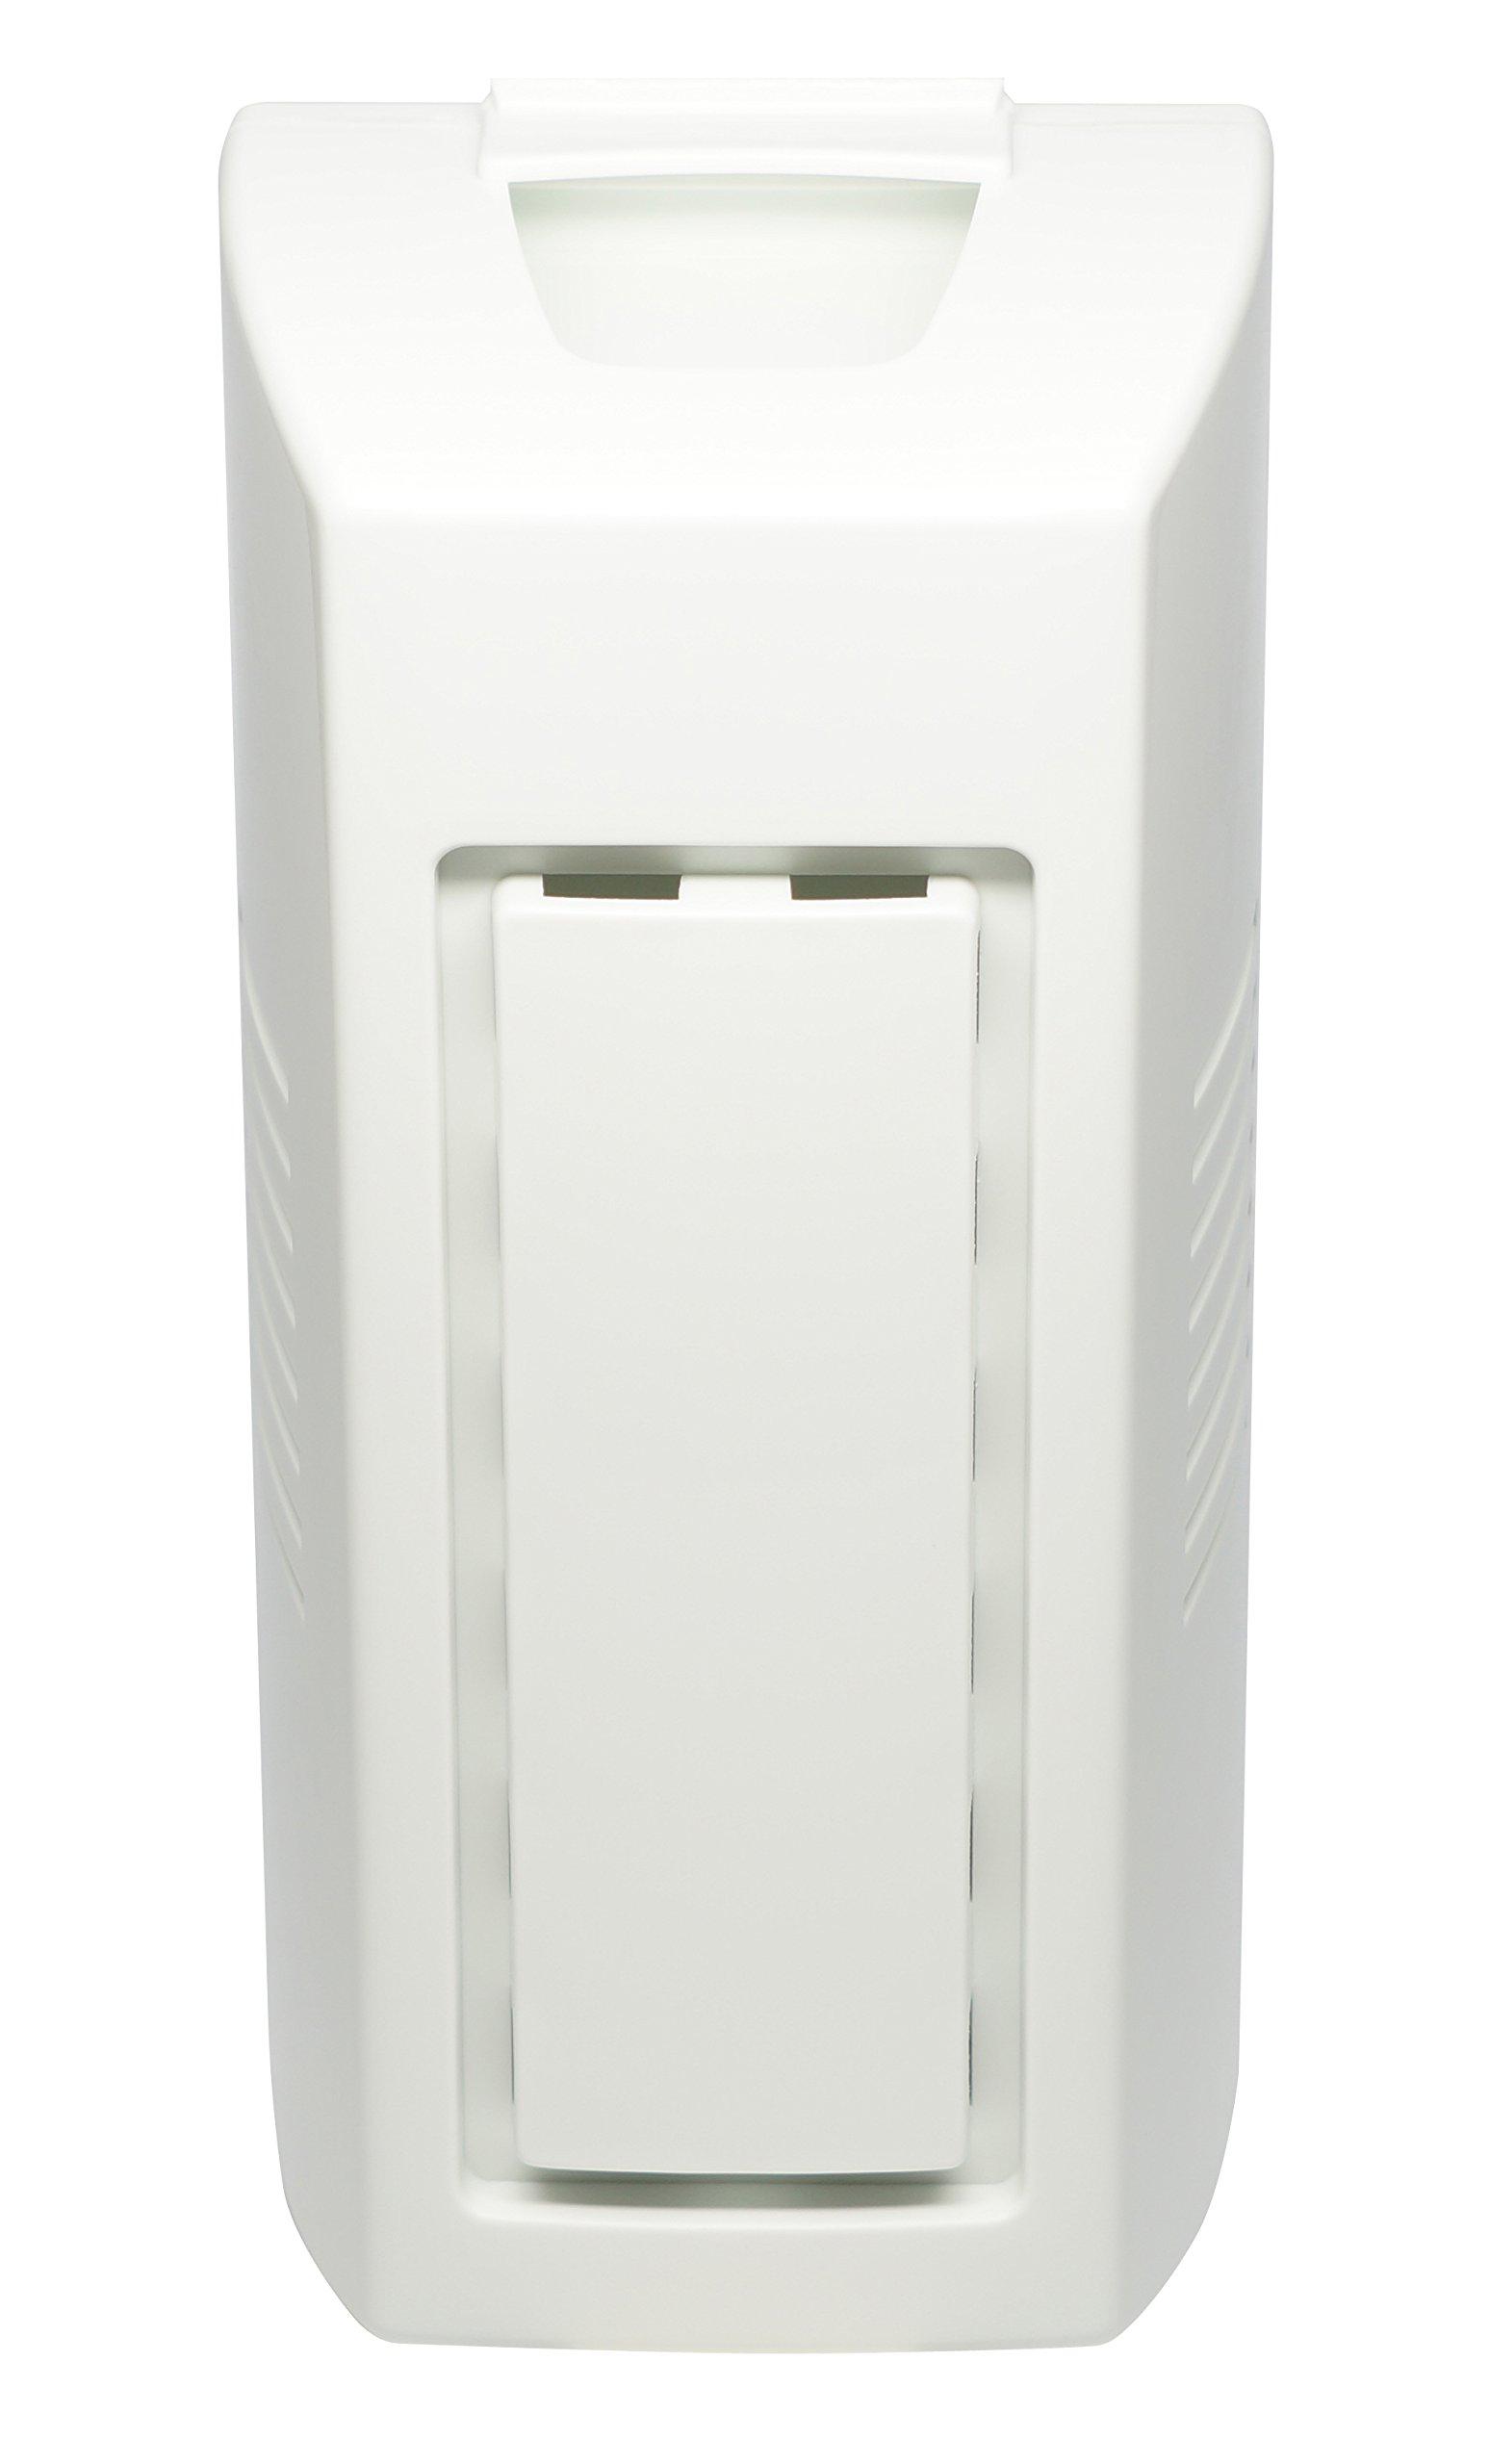 Big D 759 Large Passive Dispenser, Holds Gel or Wick Deodorants - Air freshener dispenser ideal for restrooms, offices, schools, restaurants, hotels, stores